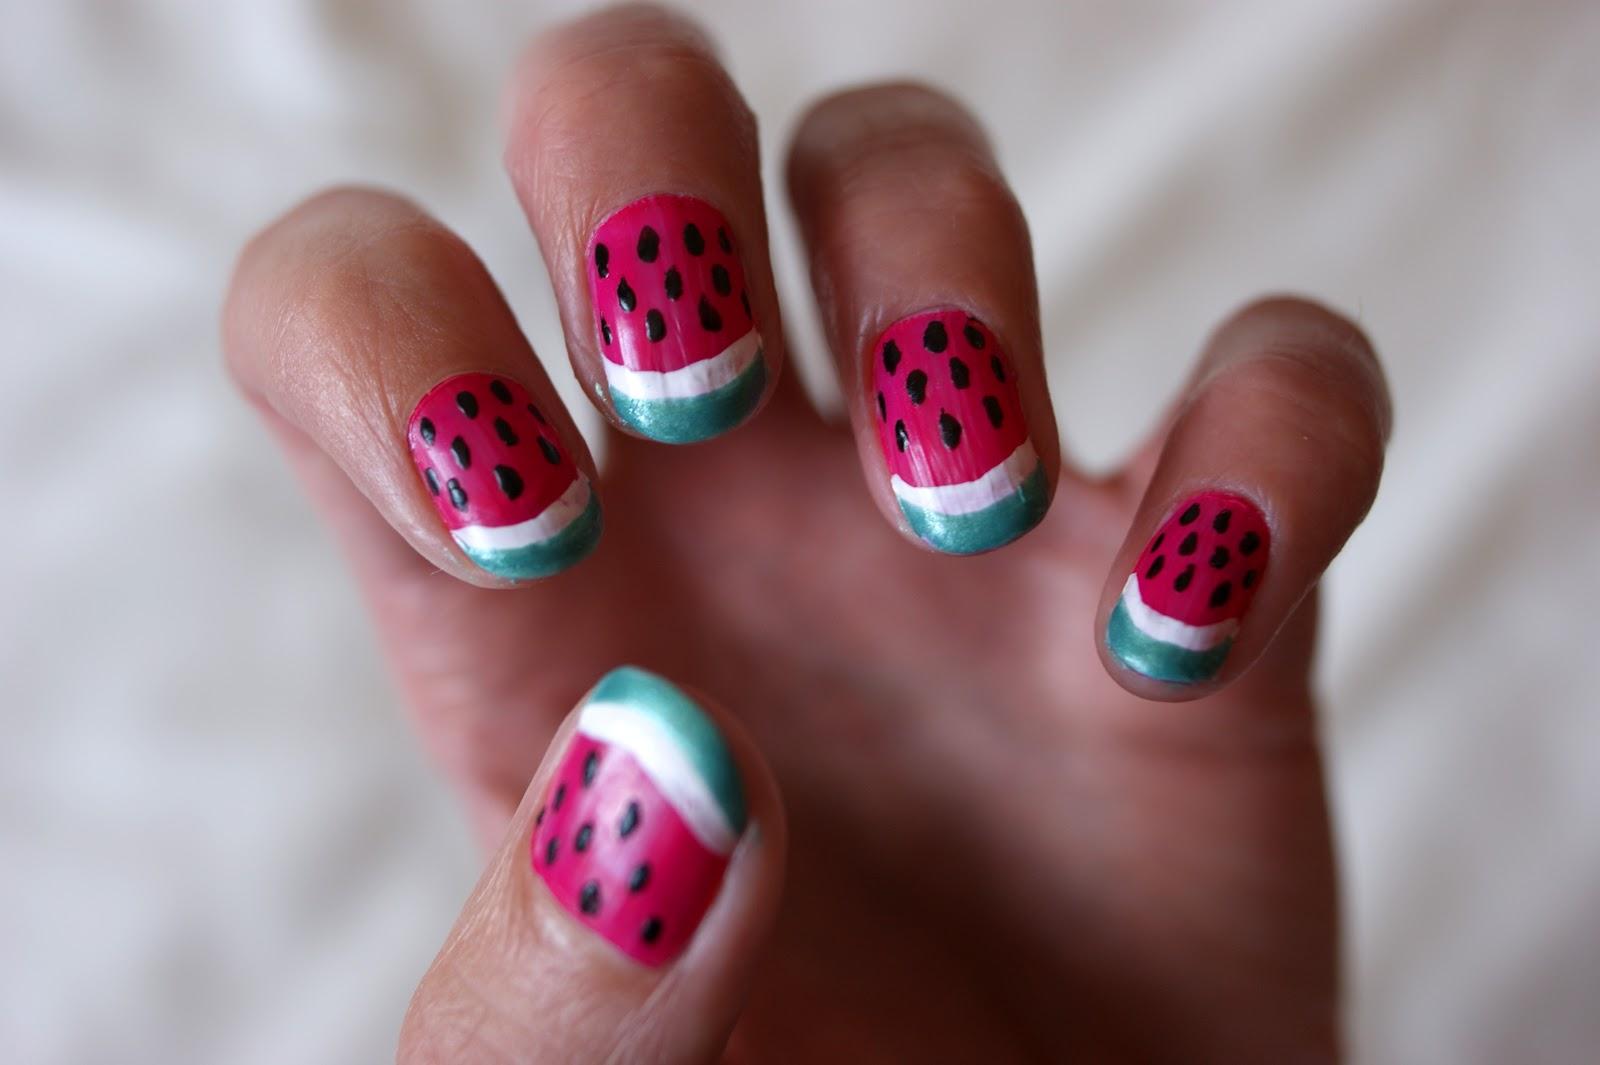 Unlimited by JK: Watermelon nail art